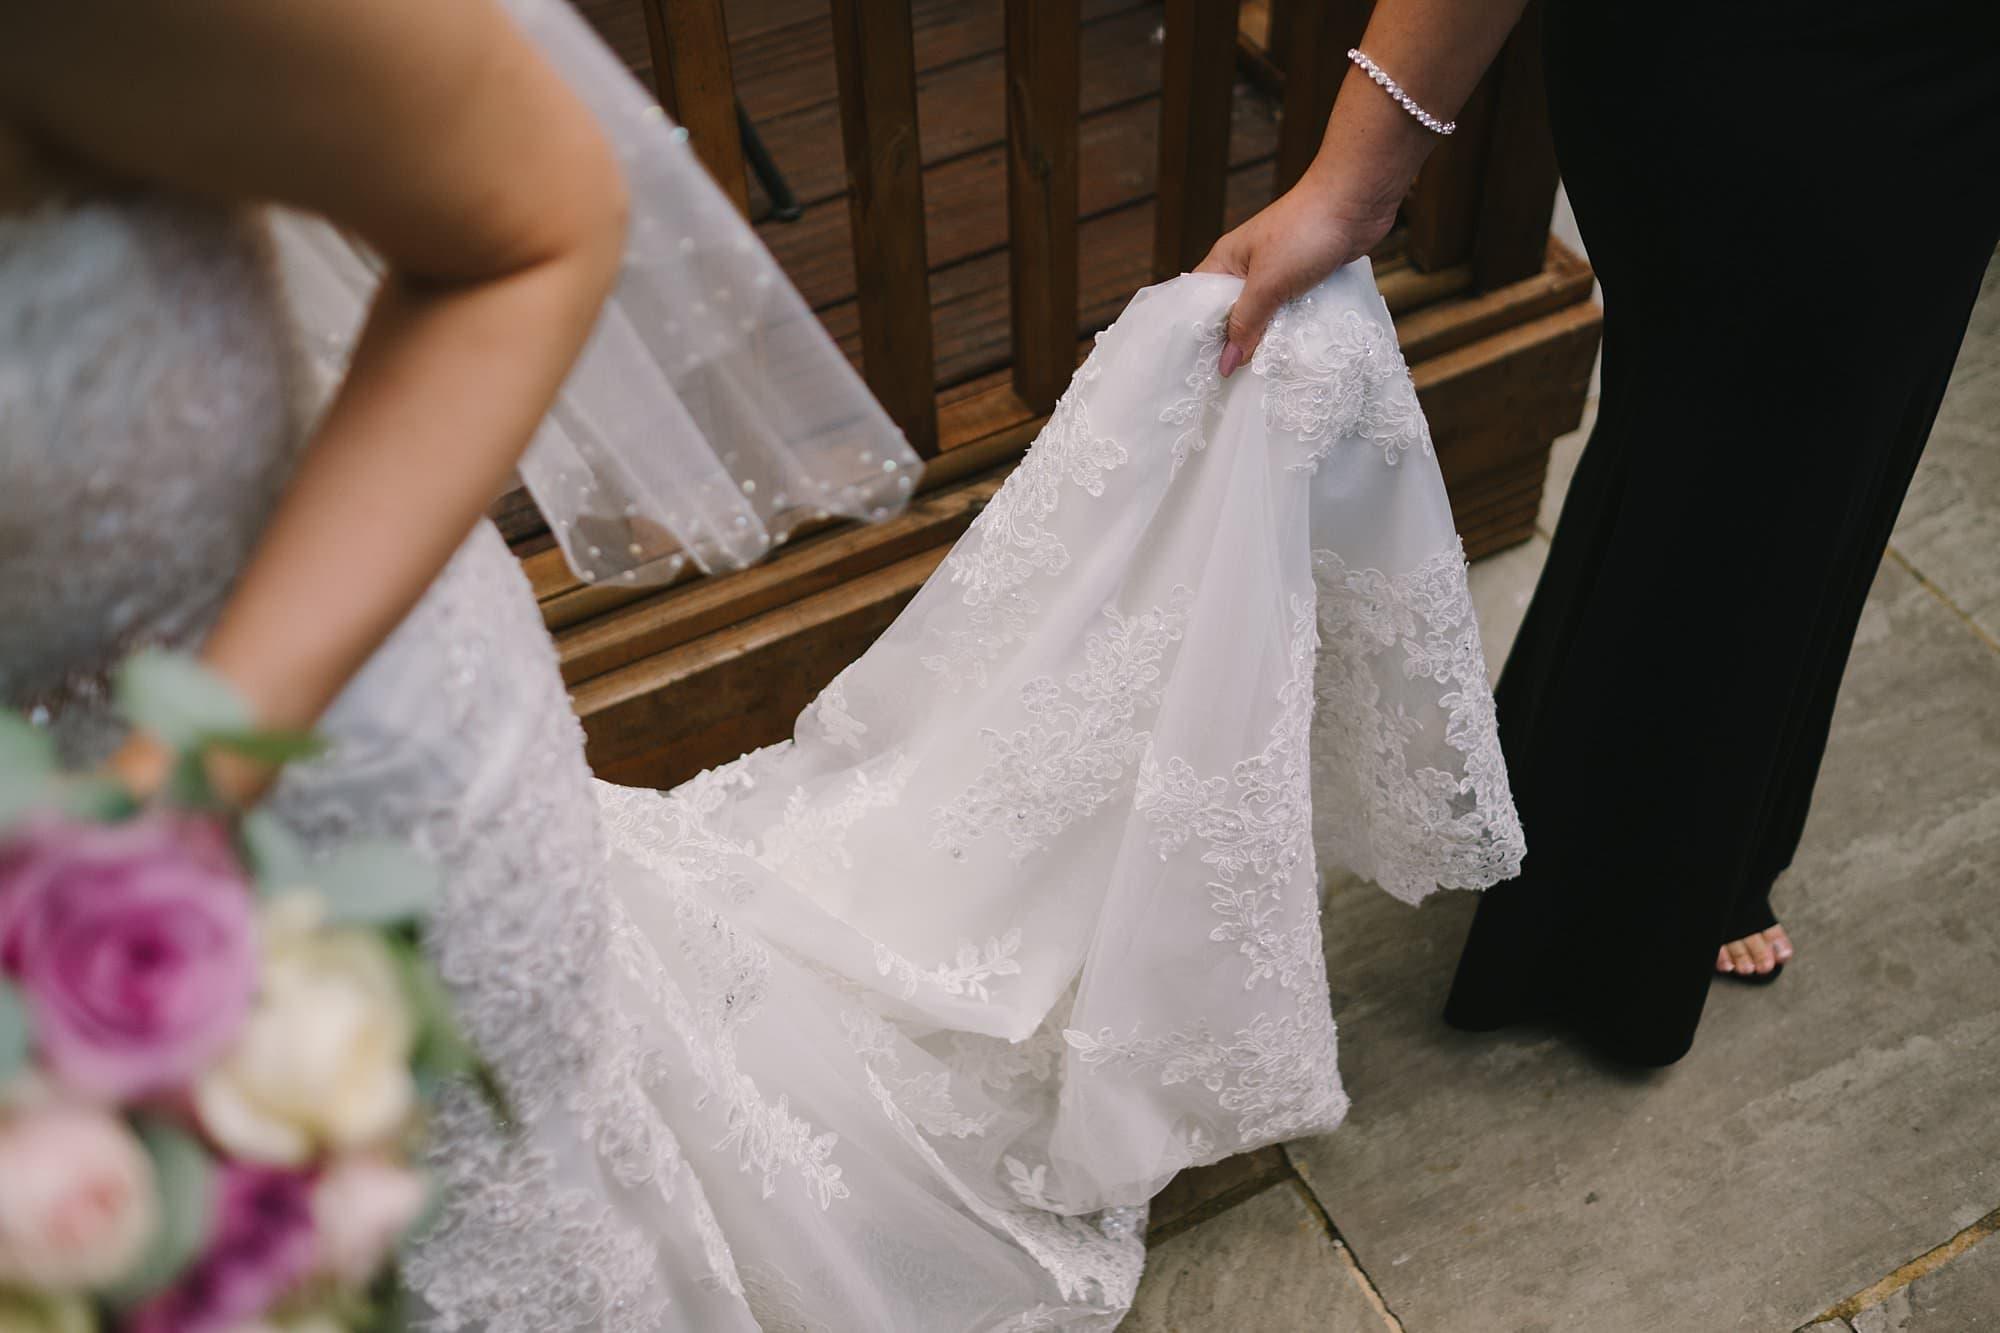 london pub wedding photographer jn 019 - The County Arms Wedding Photographer   Jen & Nick